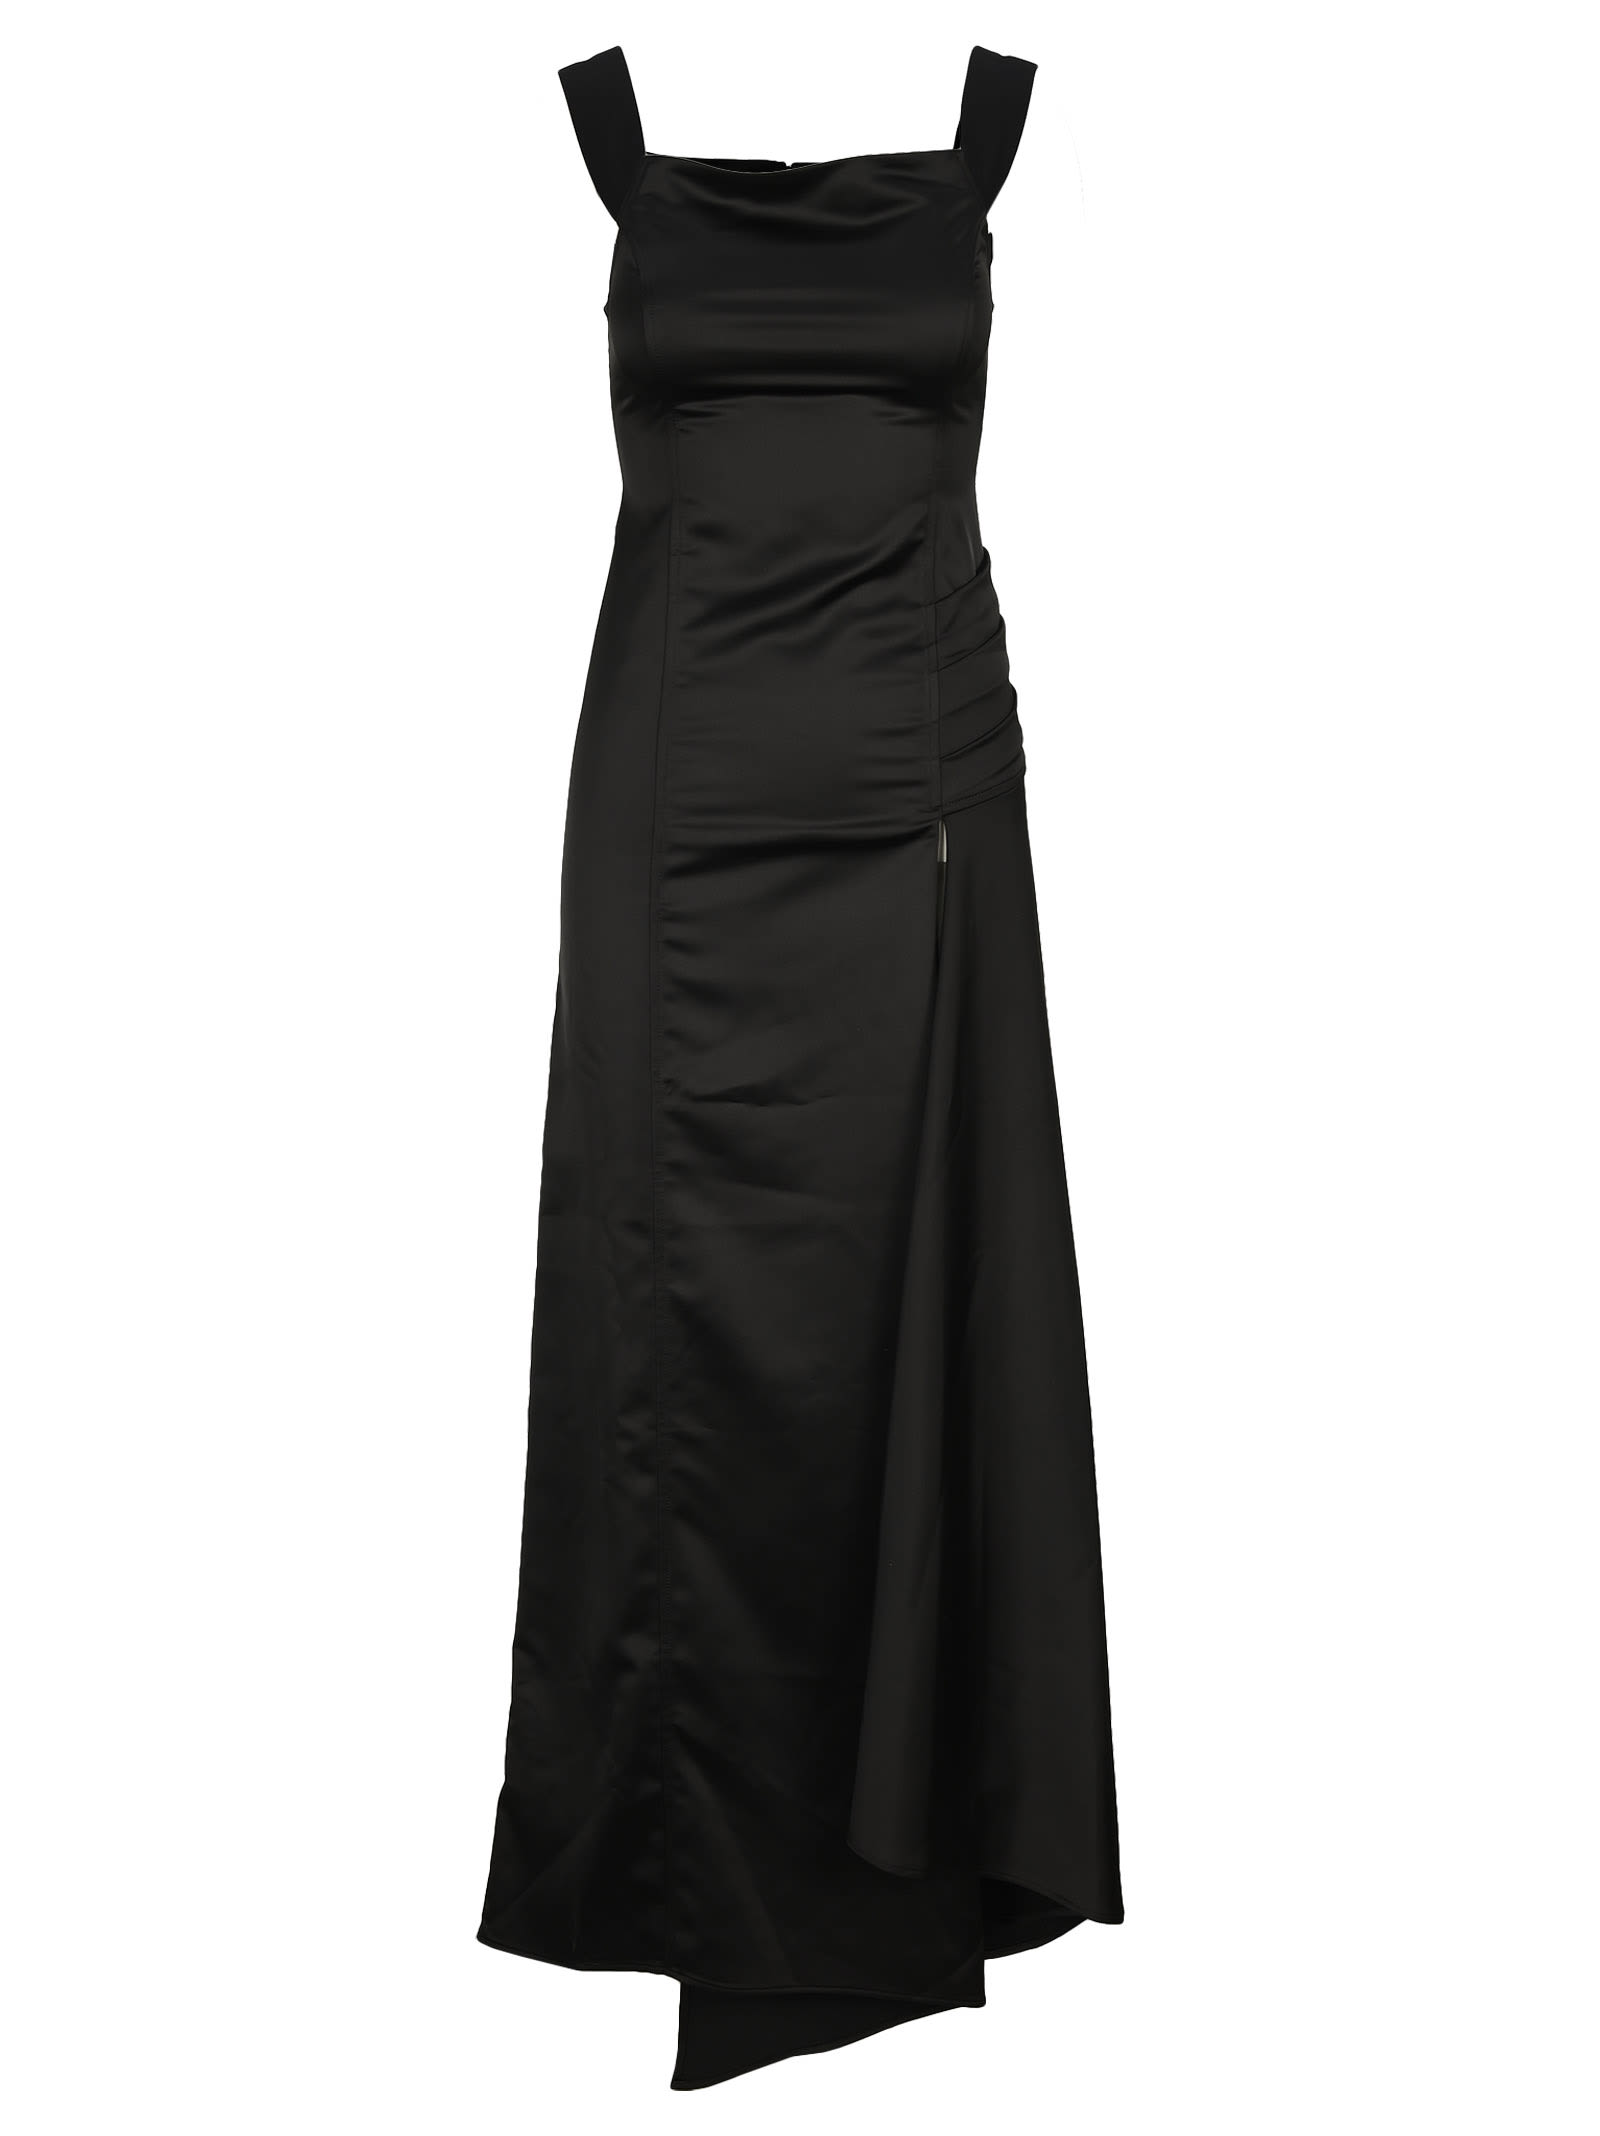 Alyx ALYX SATIN LONG DRESS